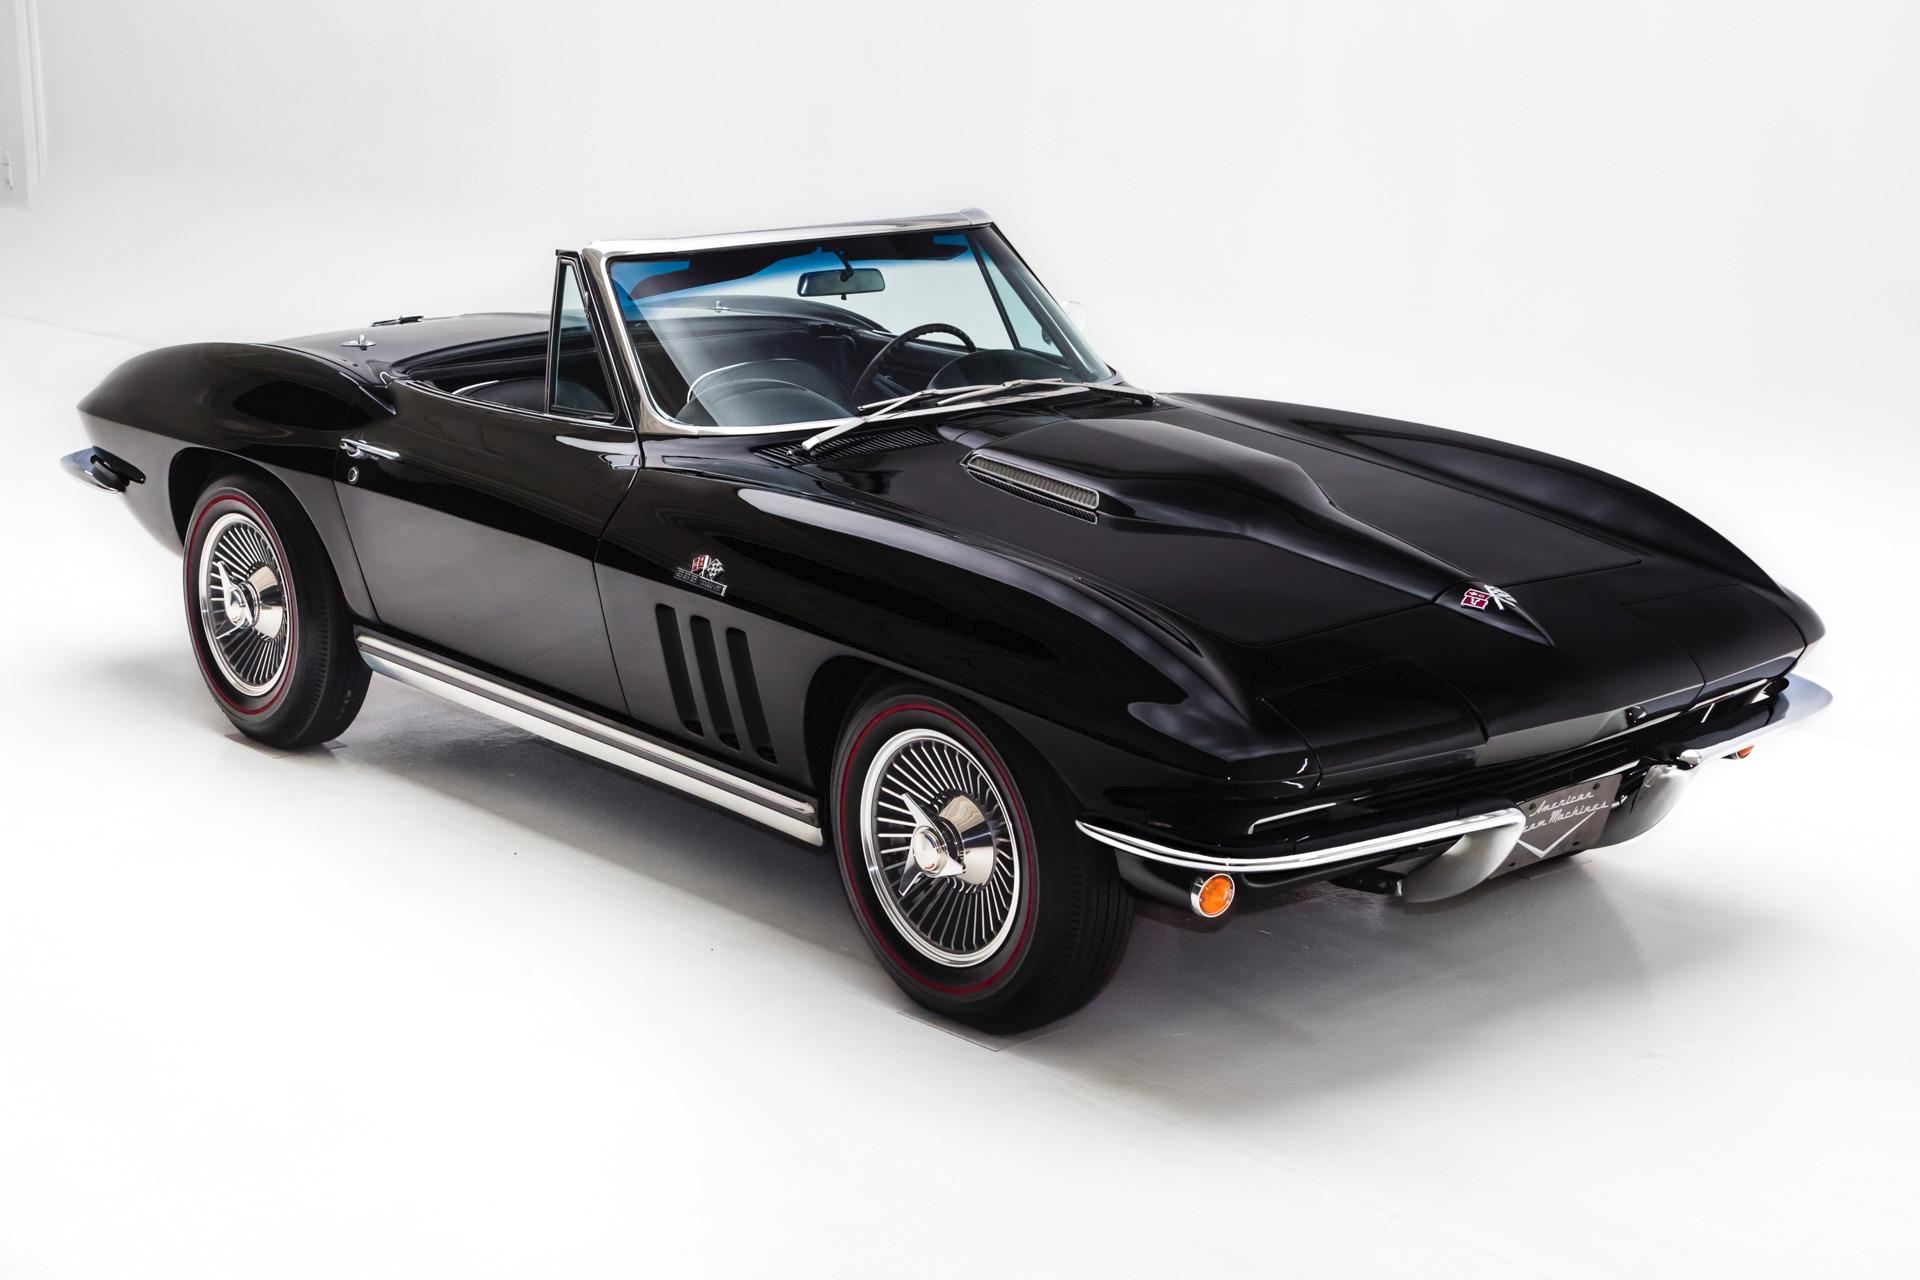 1965 Chevrolet Corvette Black #'s Match 396/425